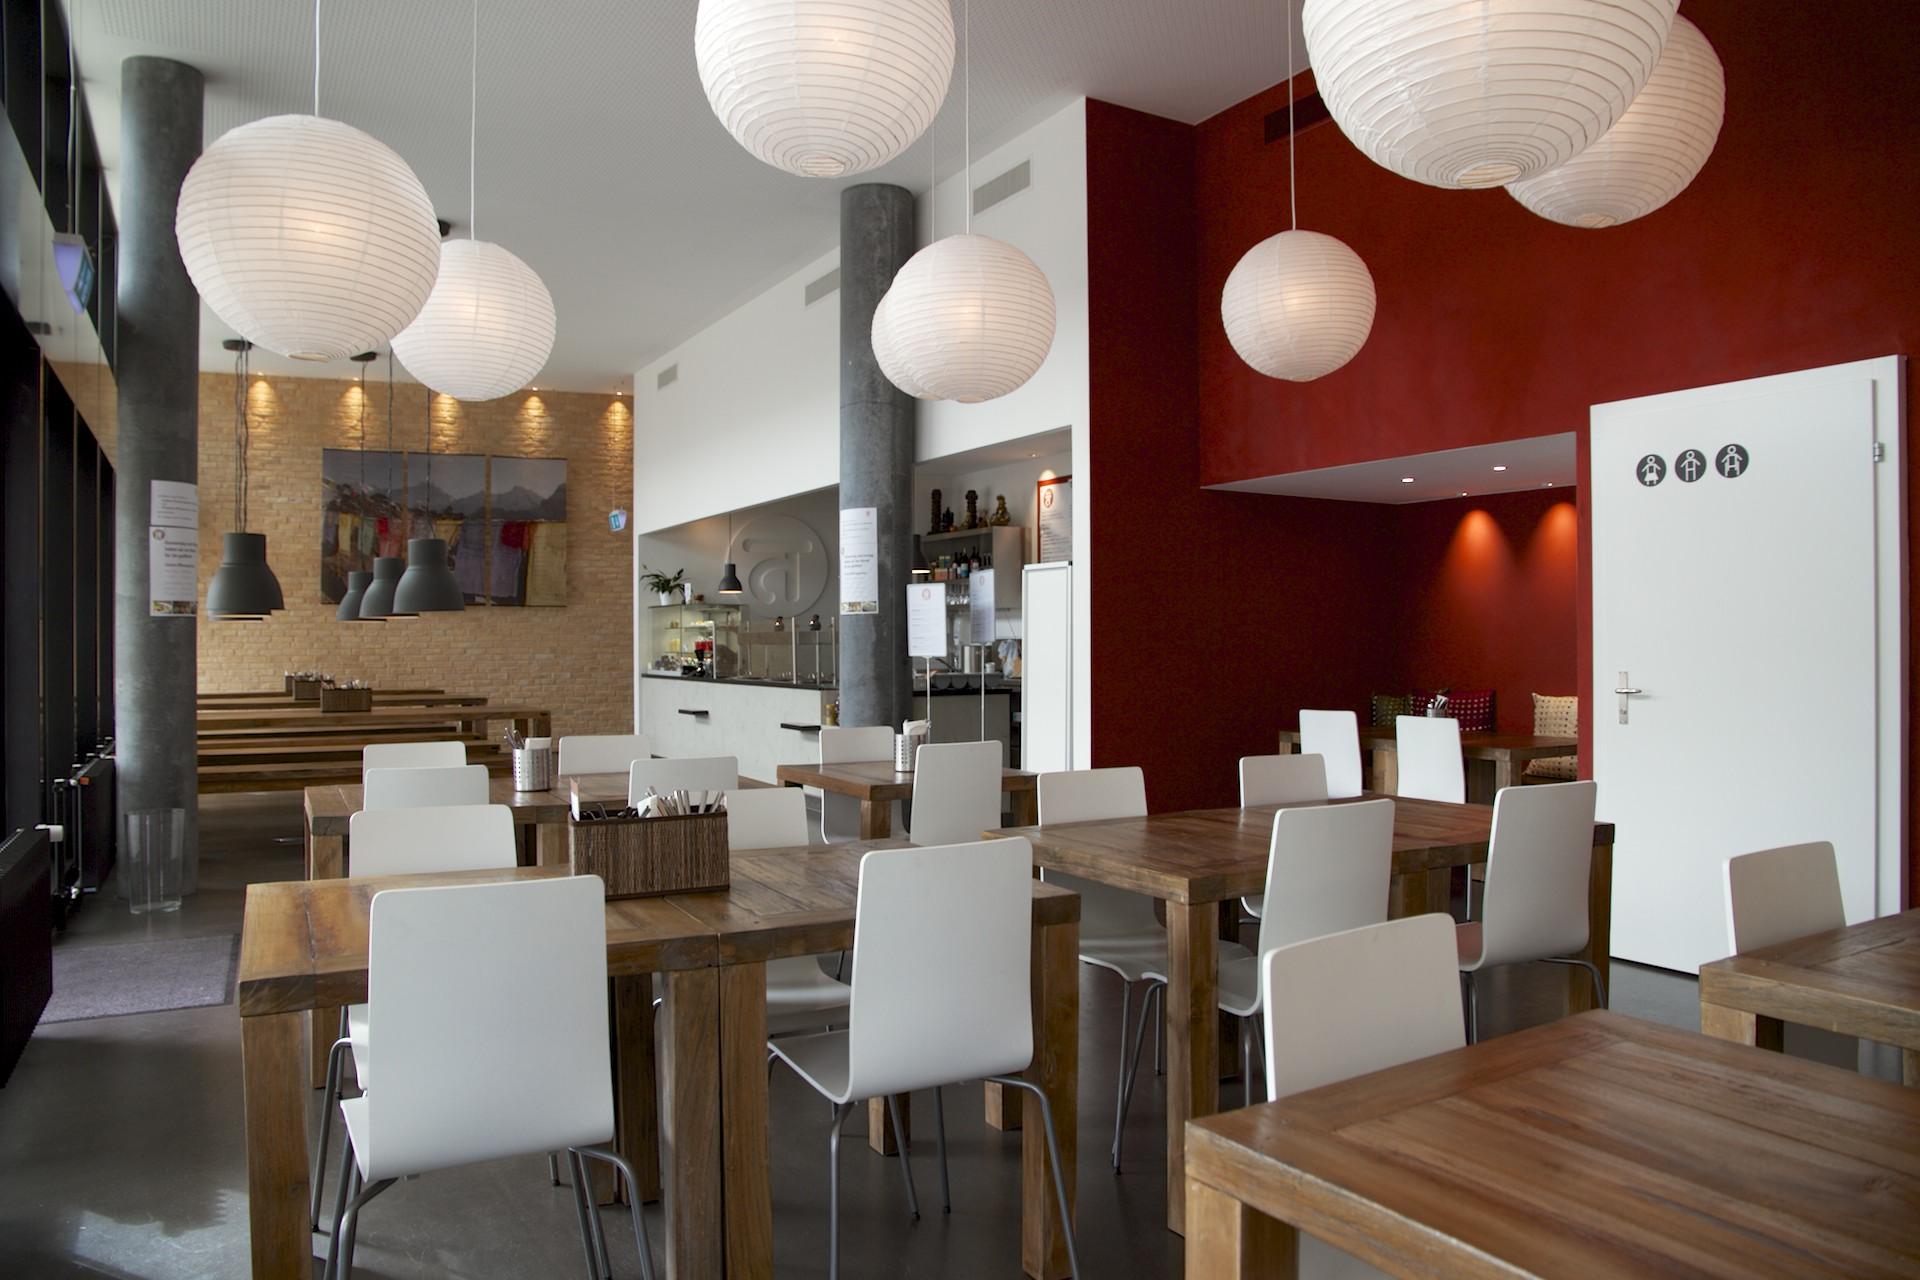 Mc donald`s restaurant der zukunft u rdz im neuen design u eray